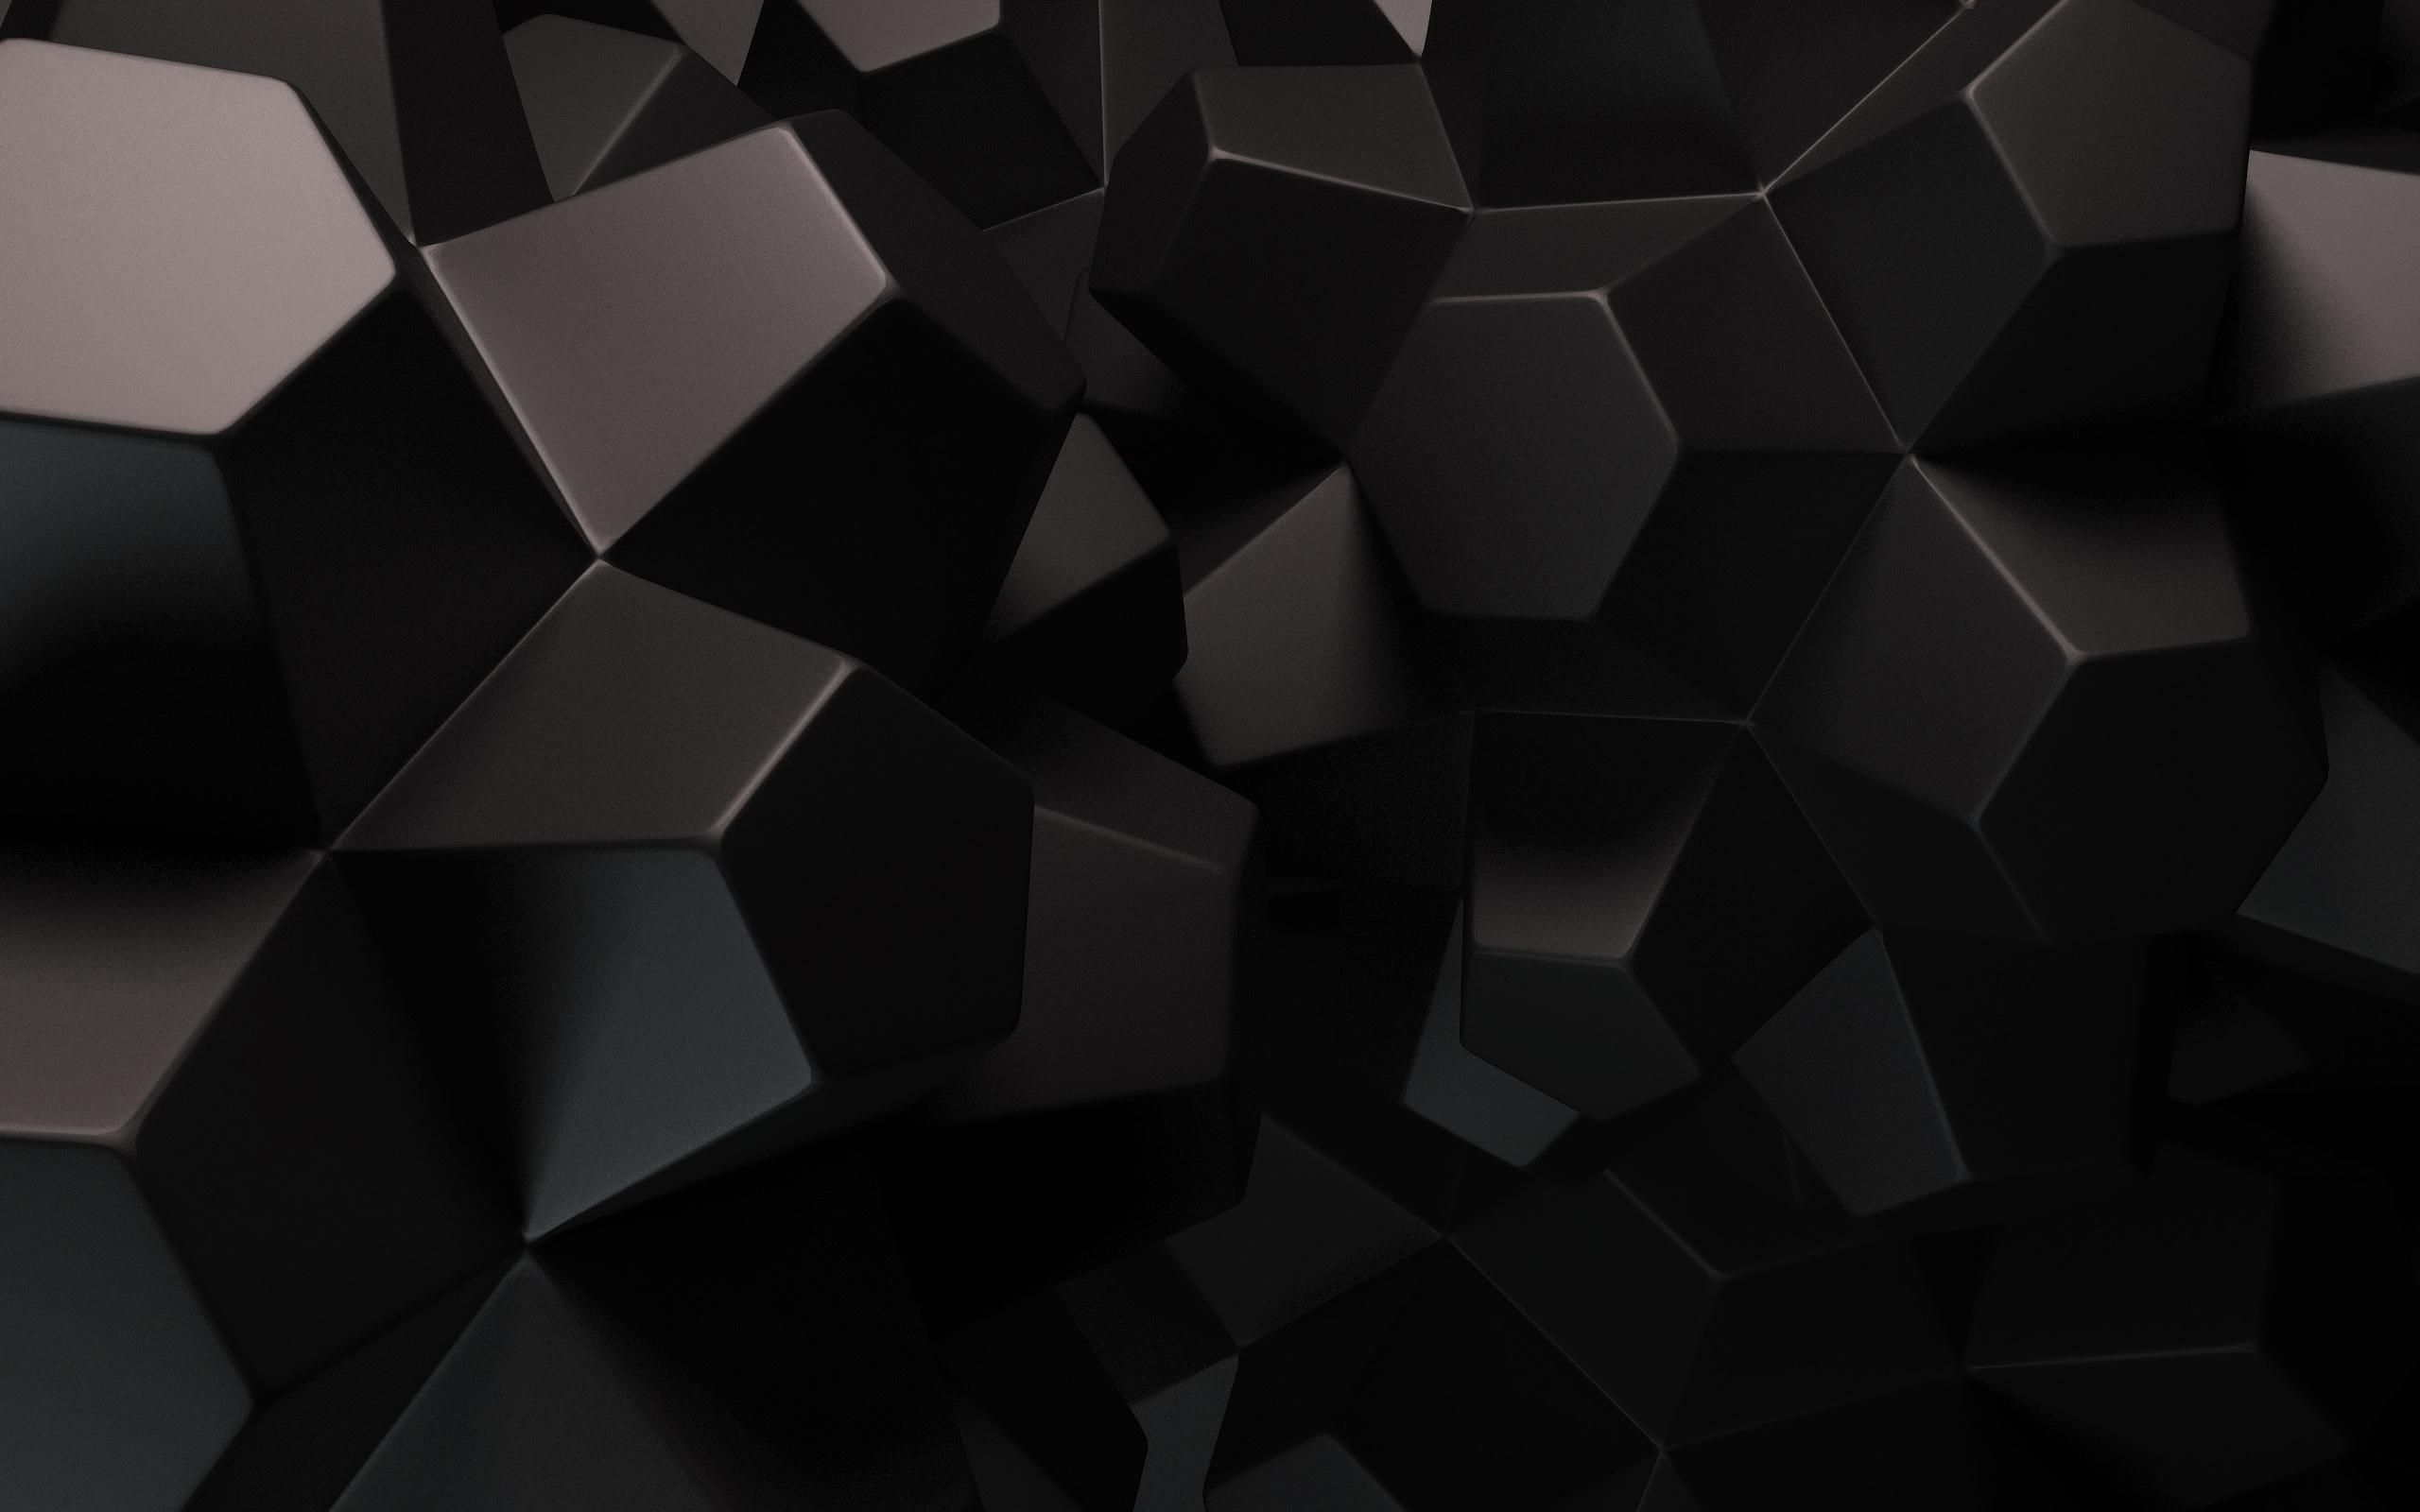 Black 3d Wallpaper 1080p For Desktop Background Wallpaper